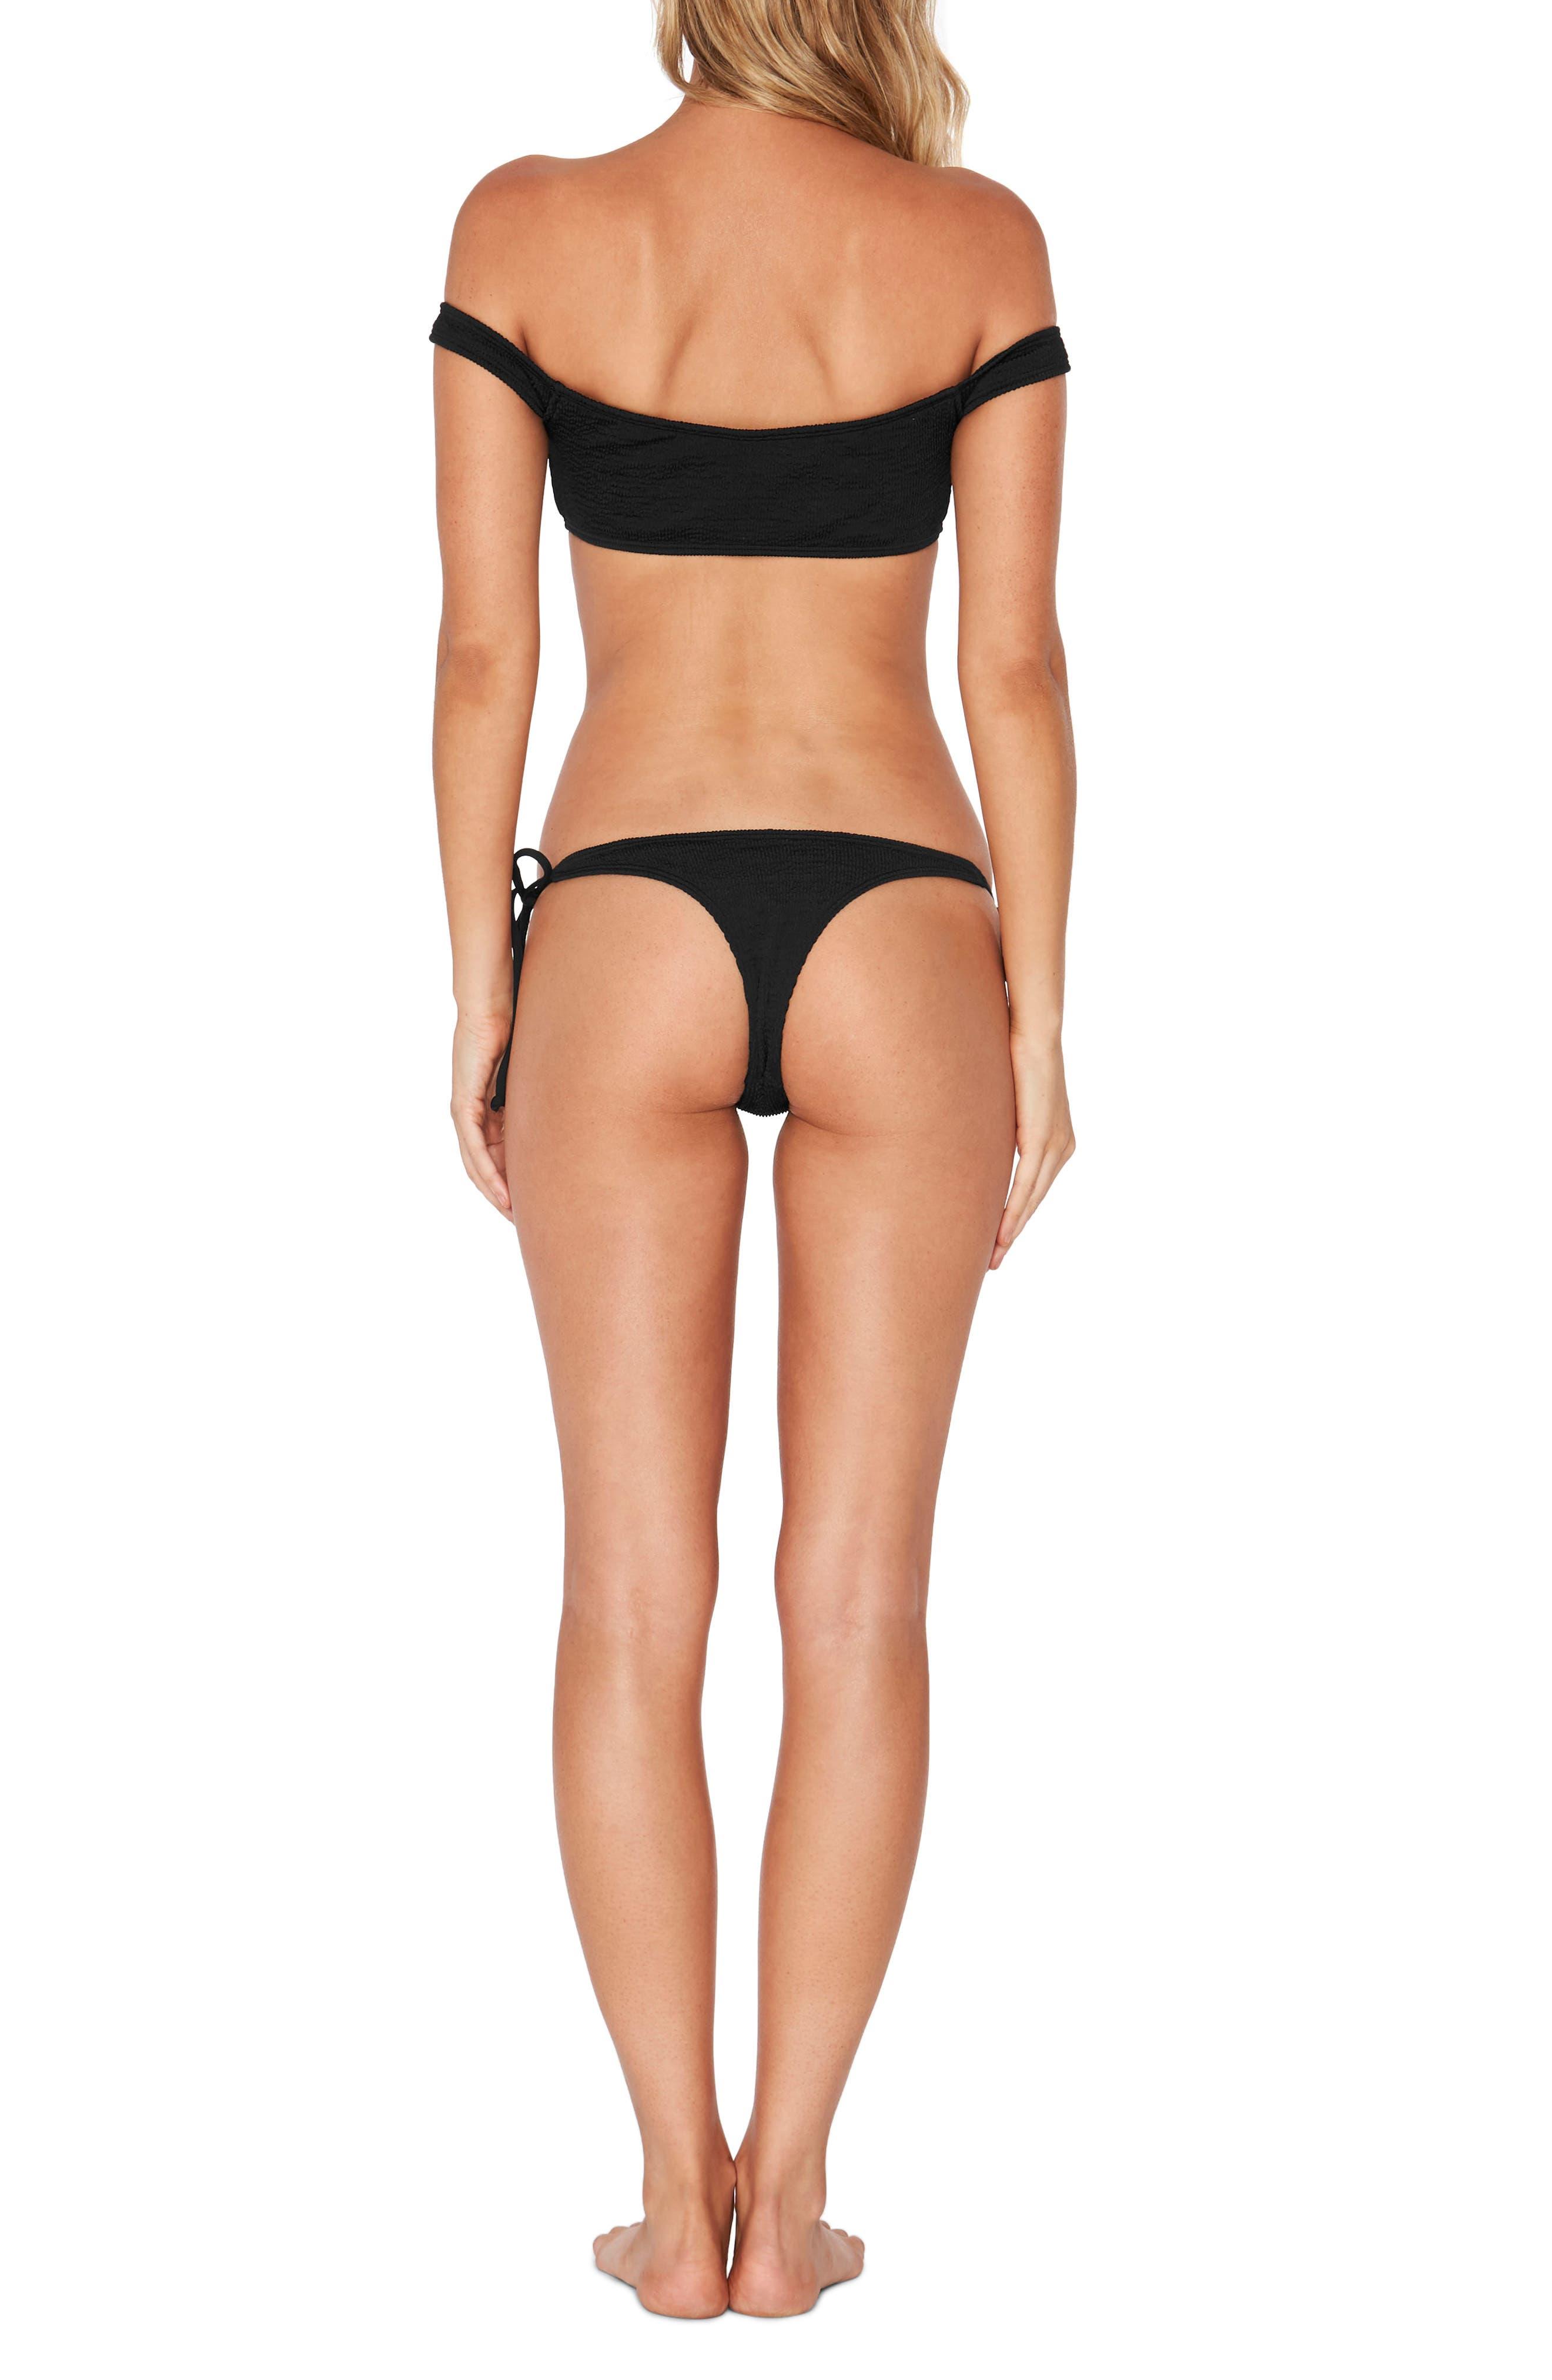 Lily Pucker Tie Side Bikini Bottoms,                             Alternate thumbnail 5, color,                             001